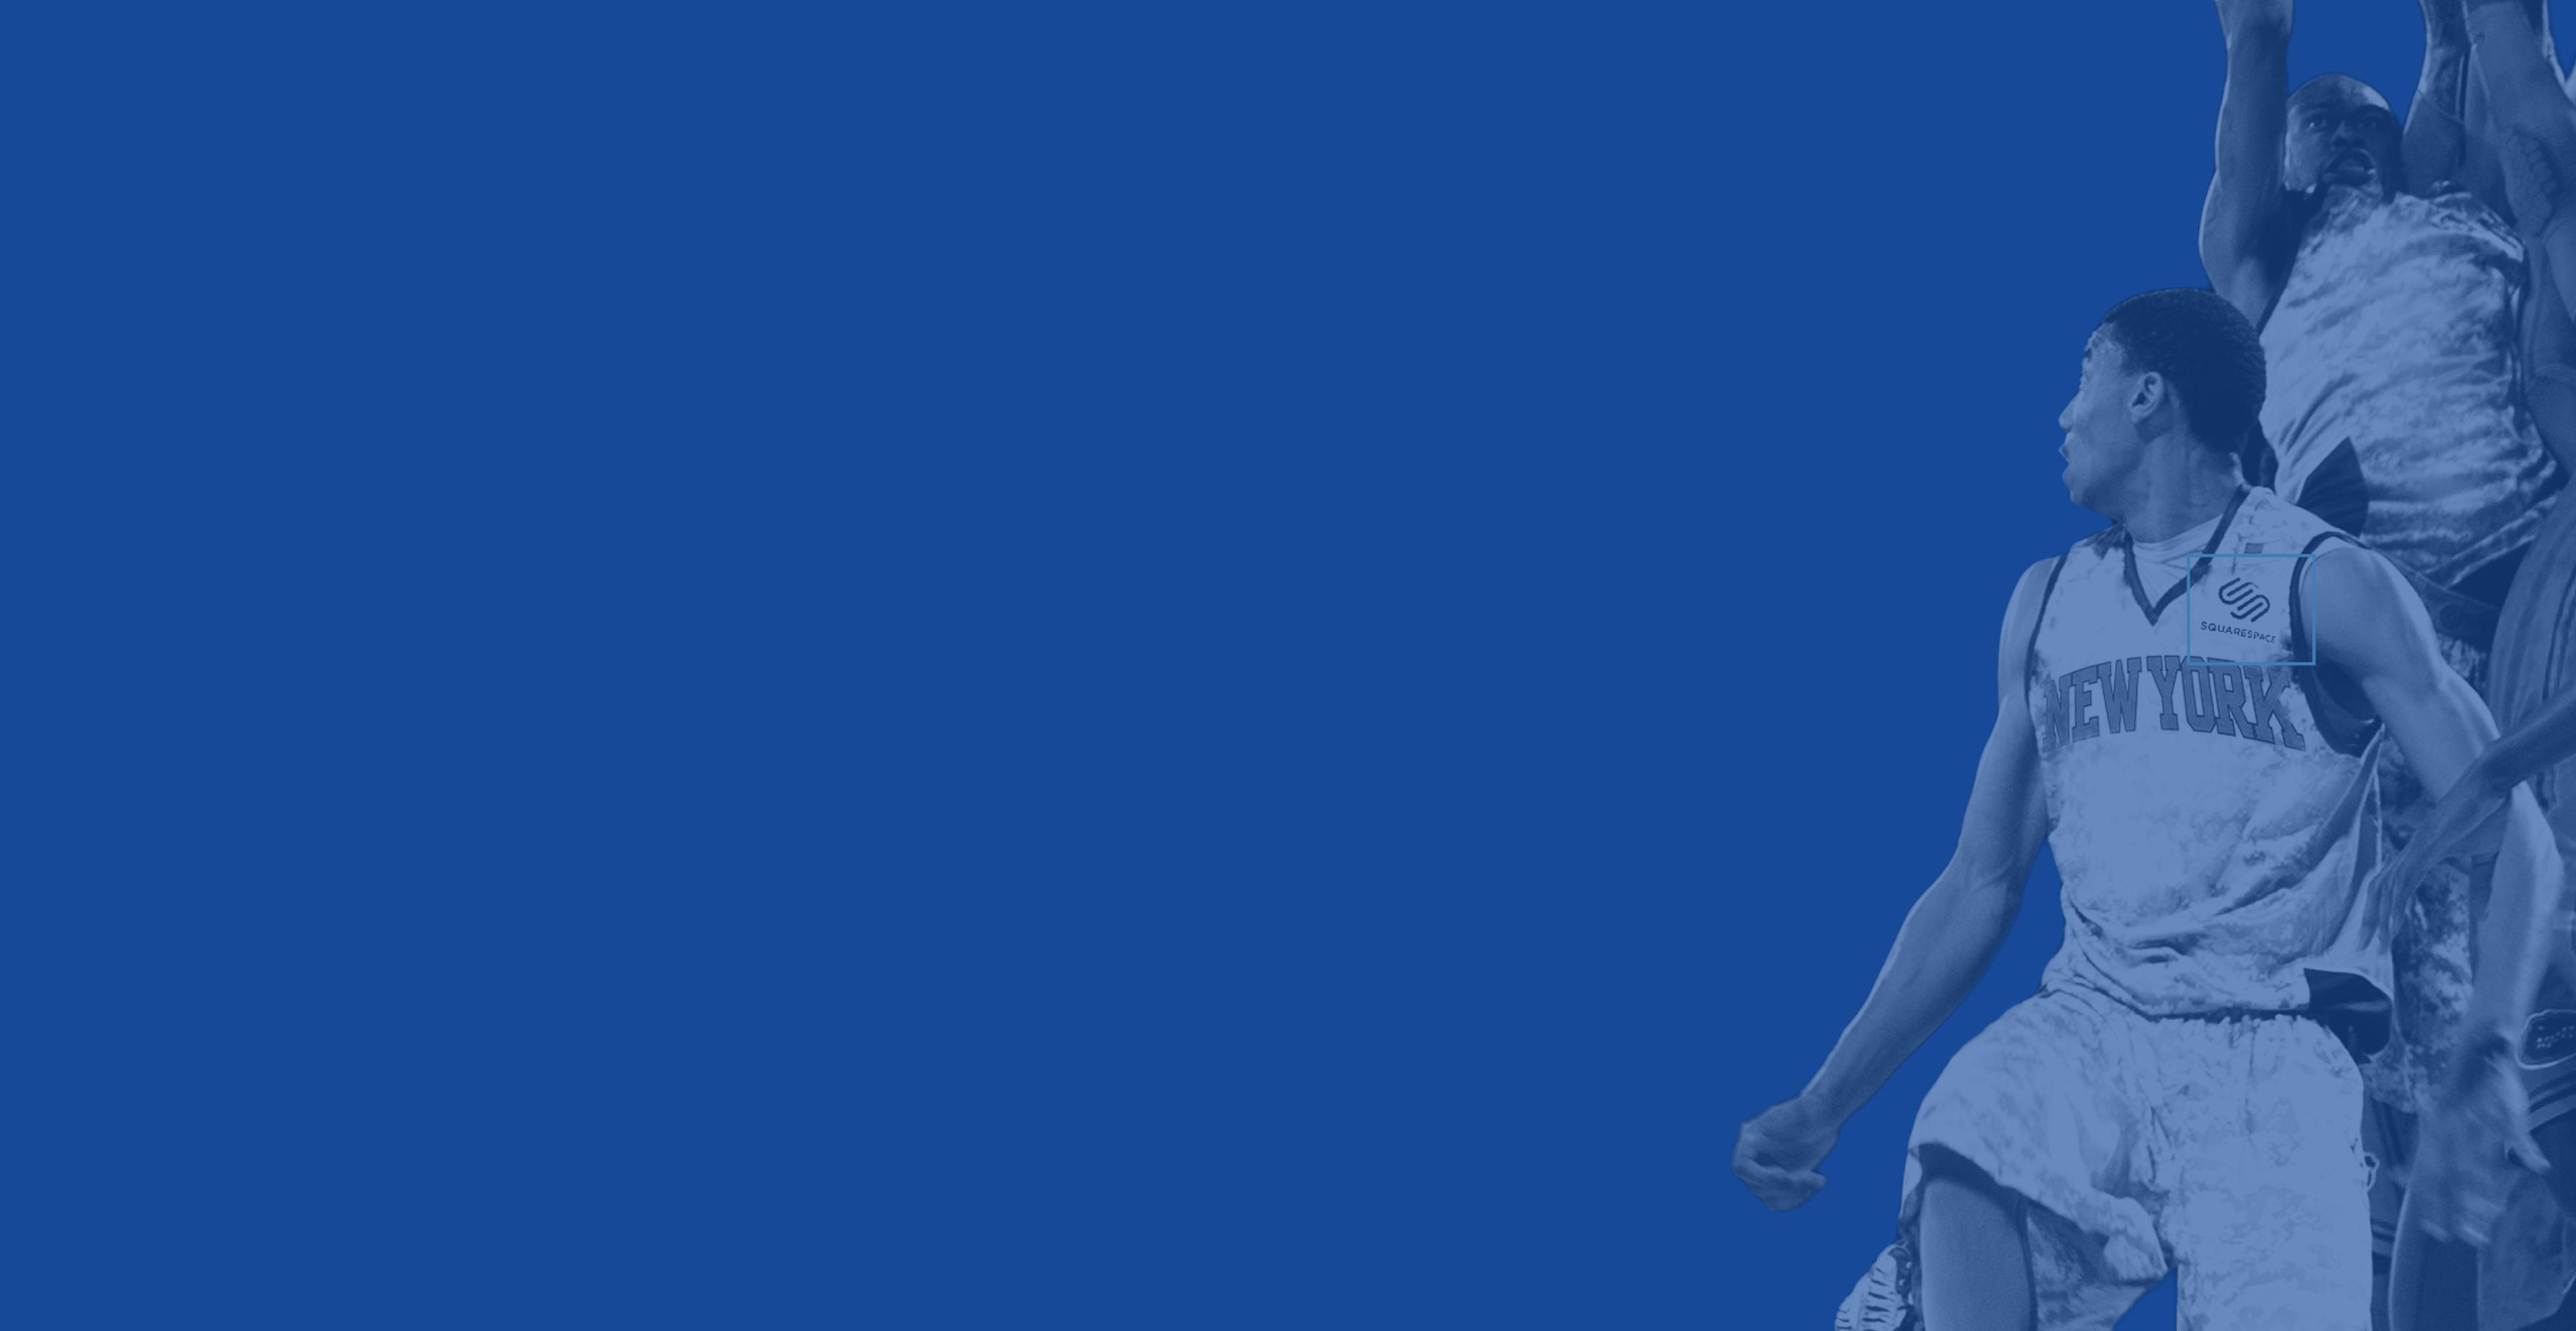 CX_knicks_sports_background_overlay2